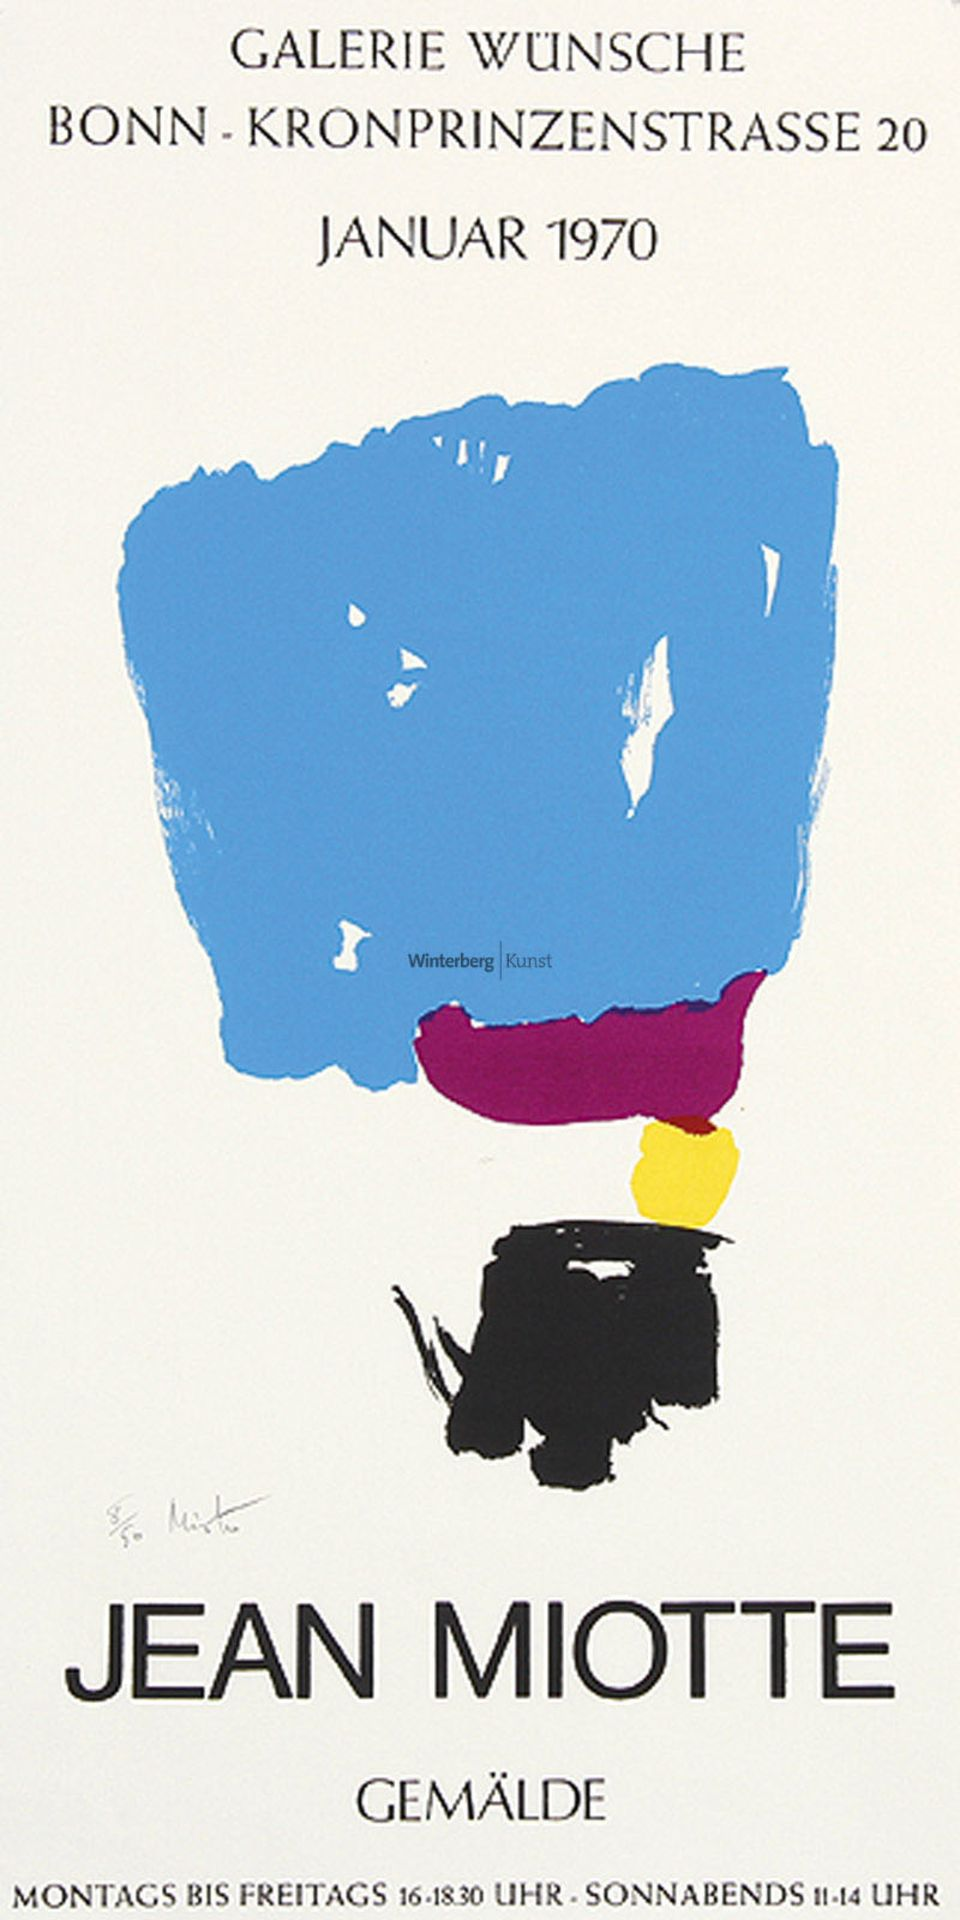 JEAN MIOTTE: Jean Miotte. Gemälde.